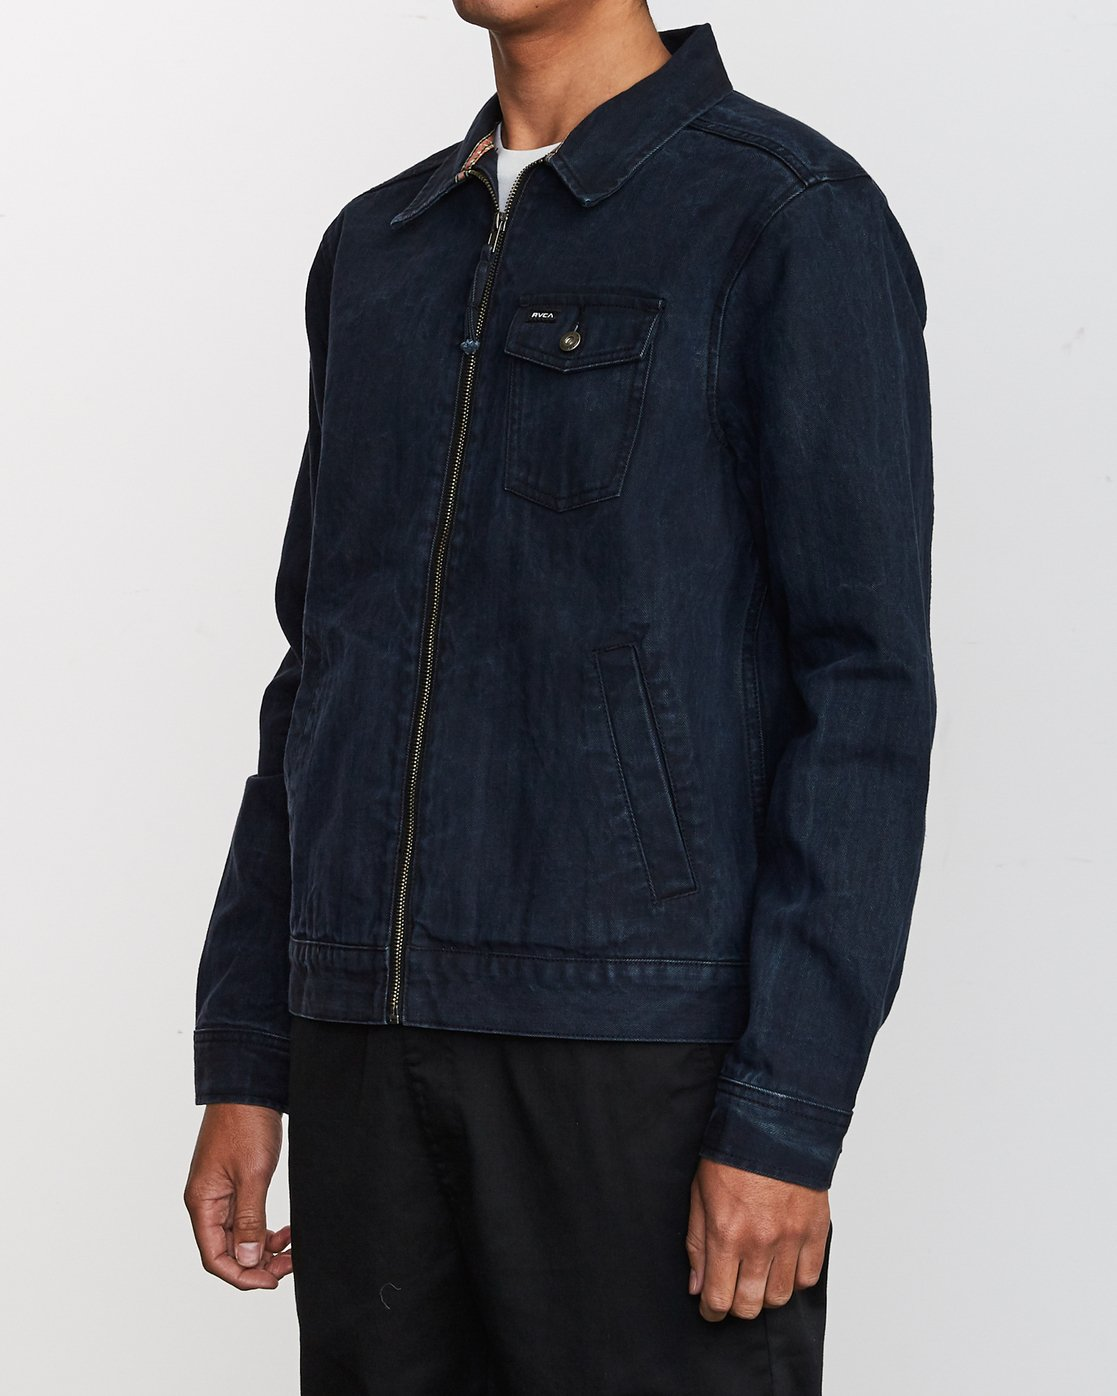 3 Hi - rade - Jeans-Jacke für Männer Blau Q1JKRFRVF9 RVCA